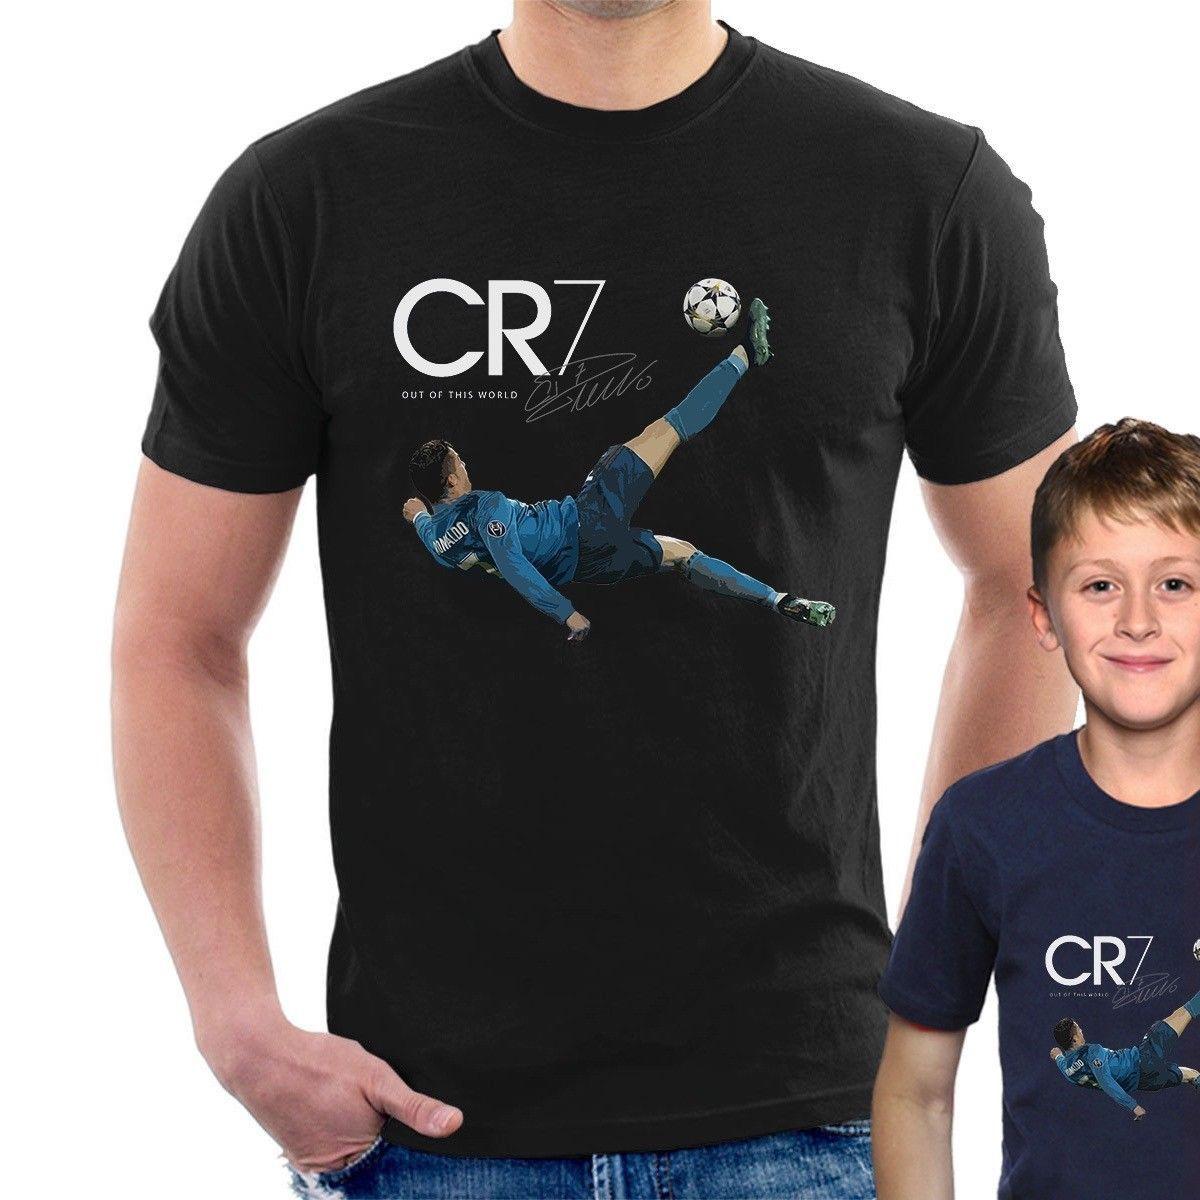 innovative design 6d64f ce79b Cr7 Bicycle Kick Goal T-shirt Cristiano Ronaldo Adult Kids Sizes Cool  Casual Pride T Shirt Men Unisex New Fashion Tshirt